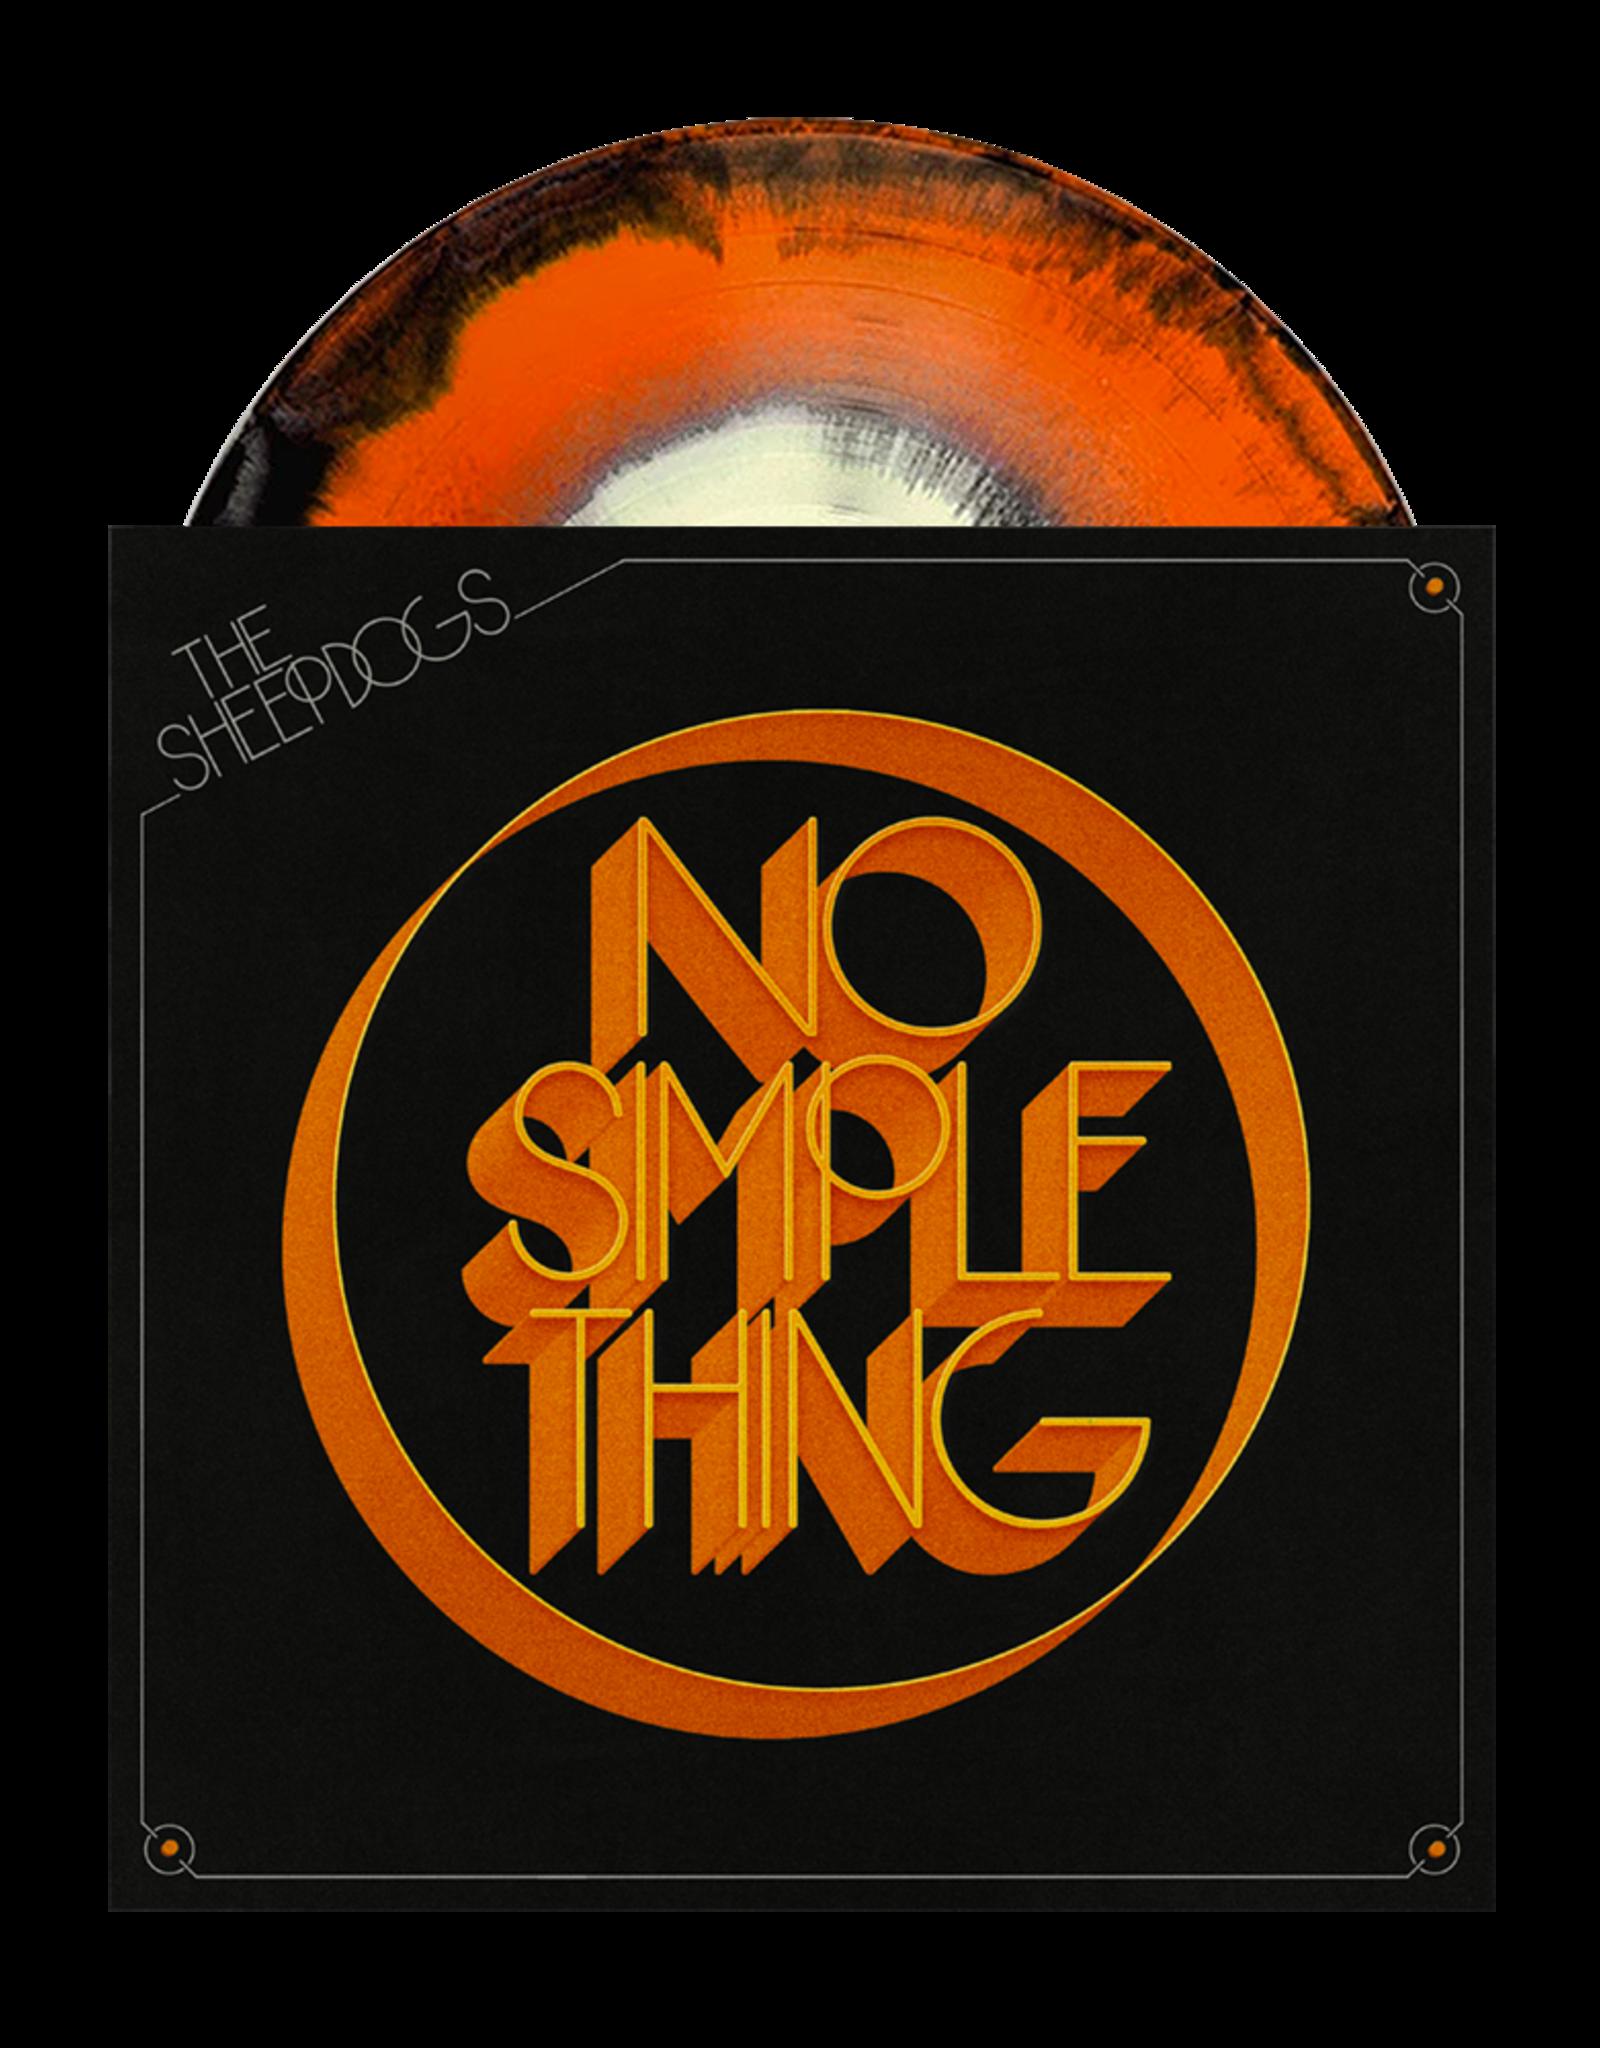 Warner Sheepdogs: No Simple Thing LP